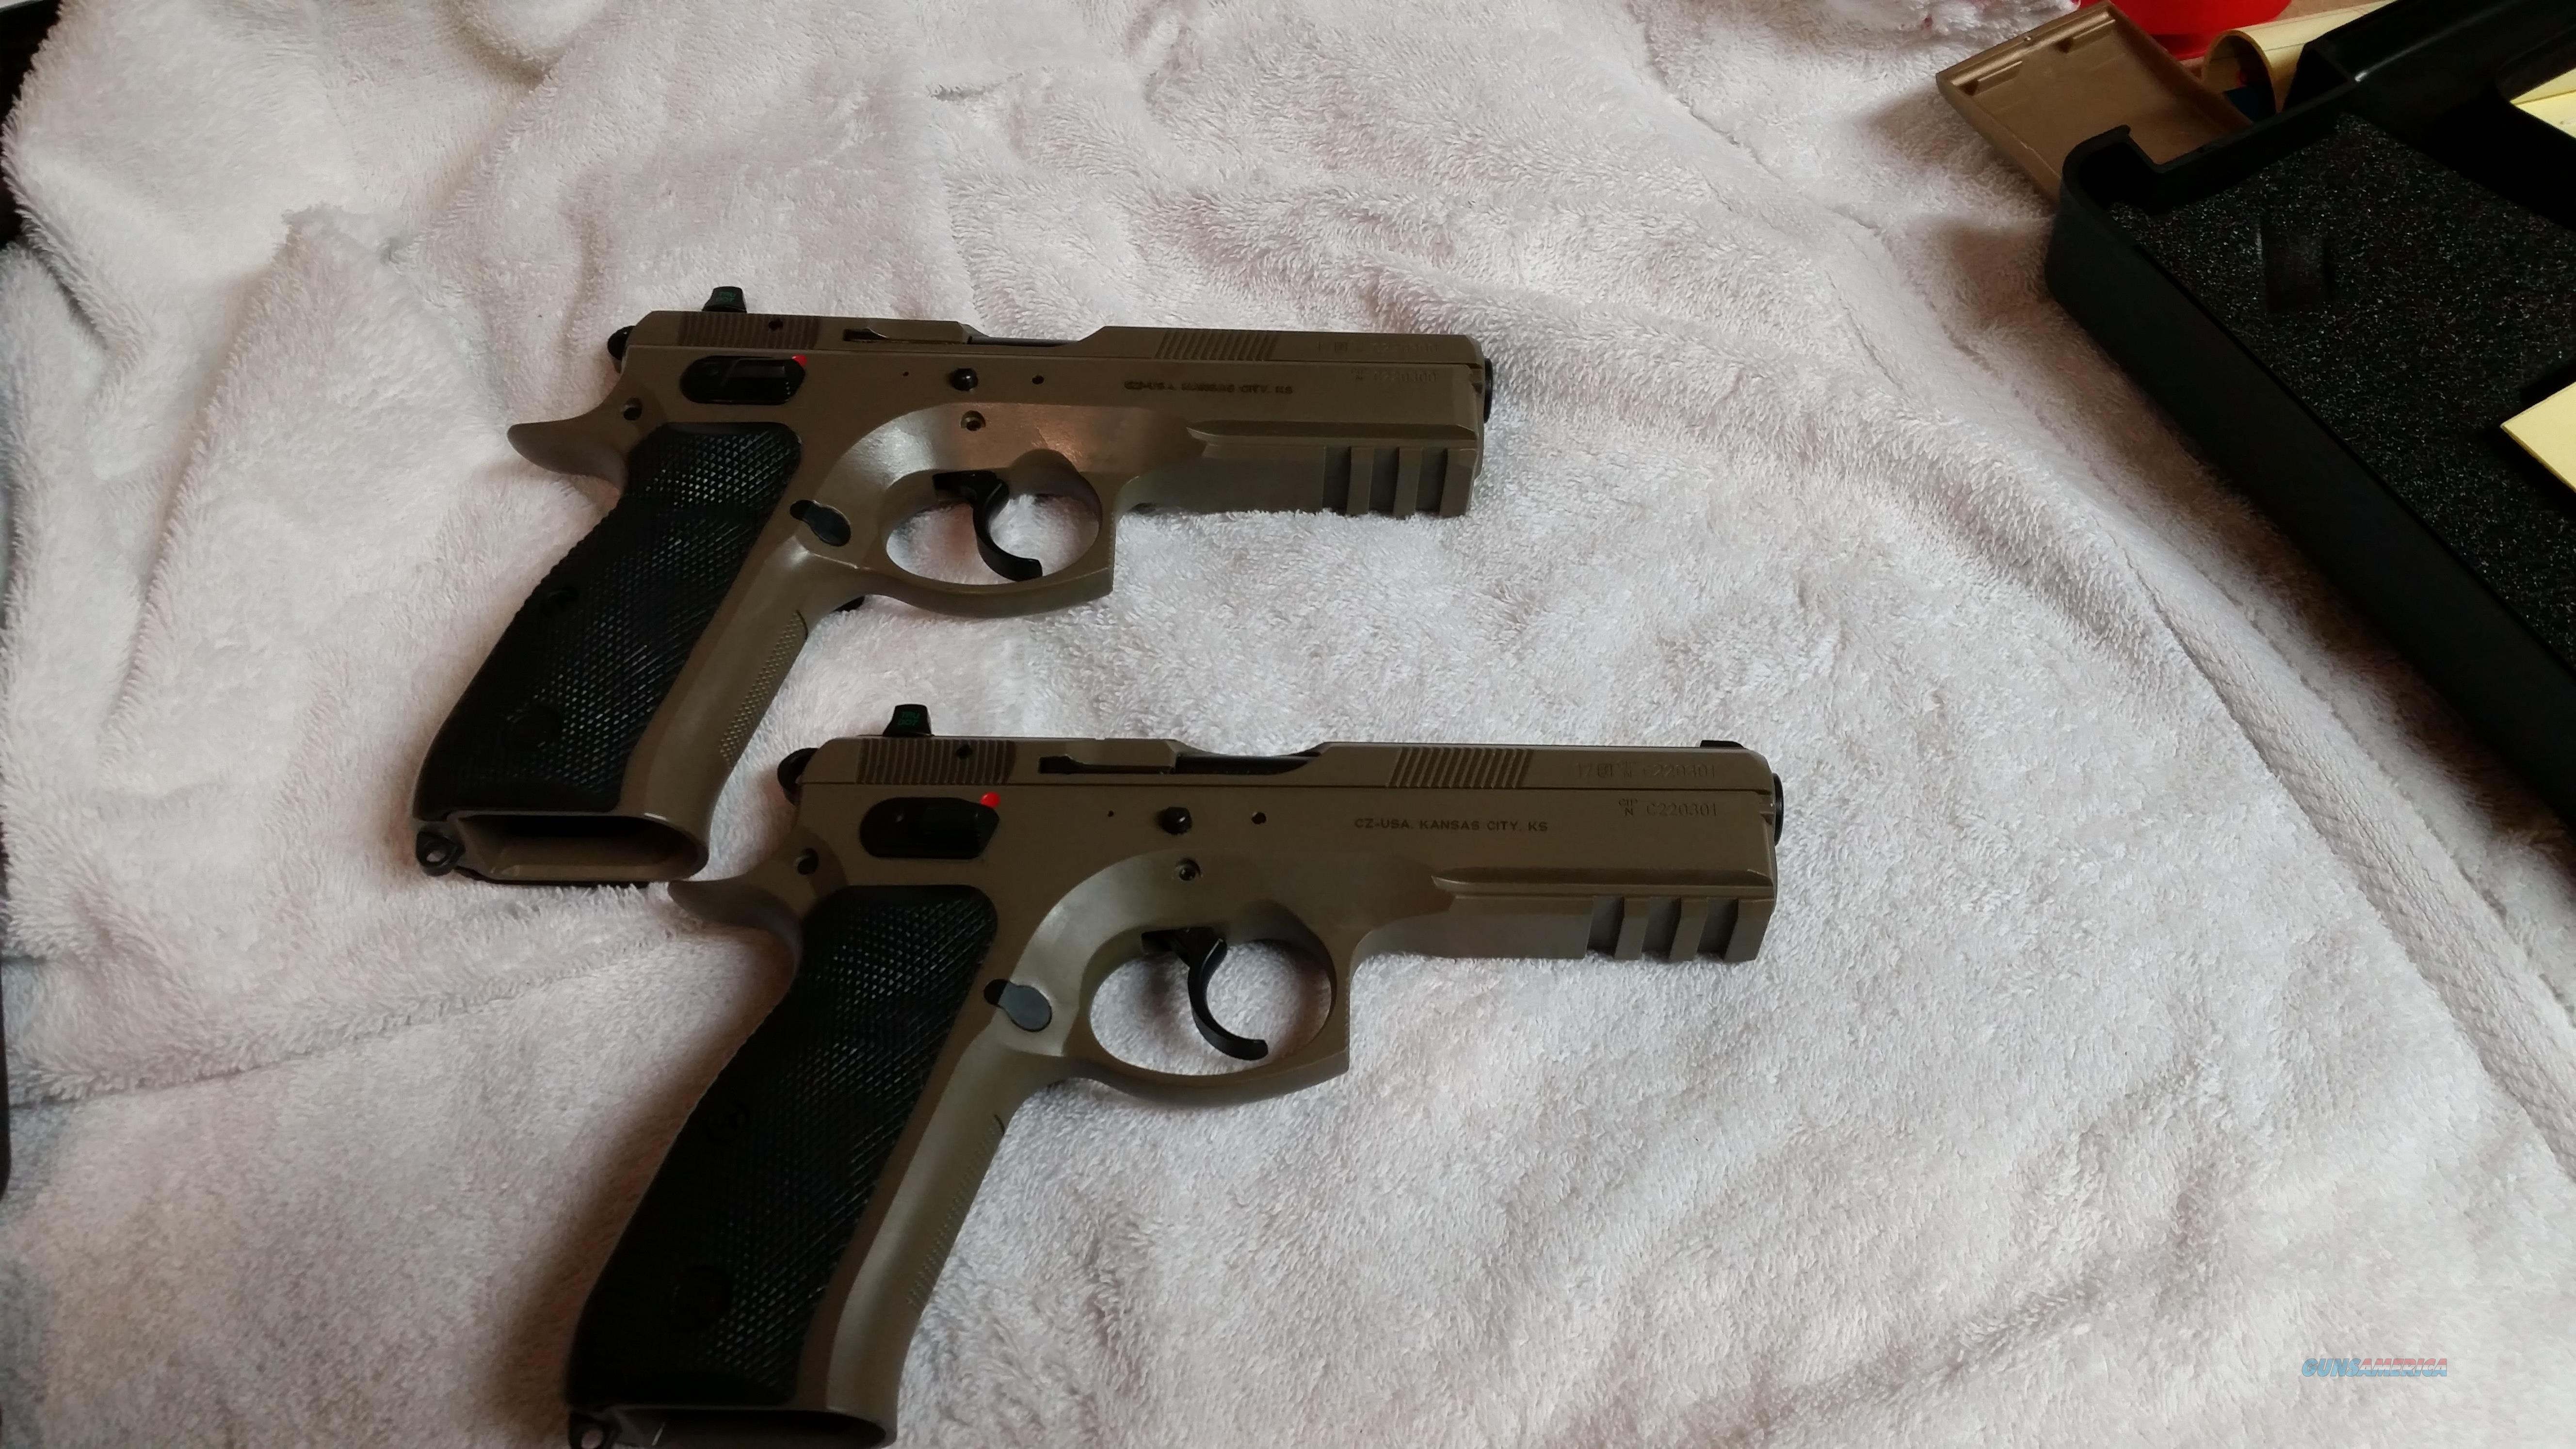 CZ Pistol Local Deals, National For Sale & User Ratings at GunsAmerica